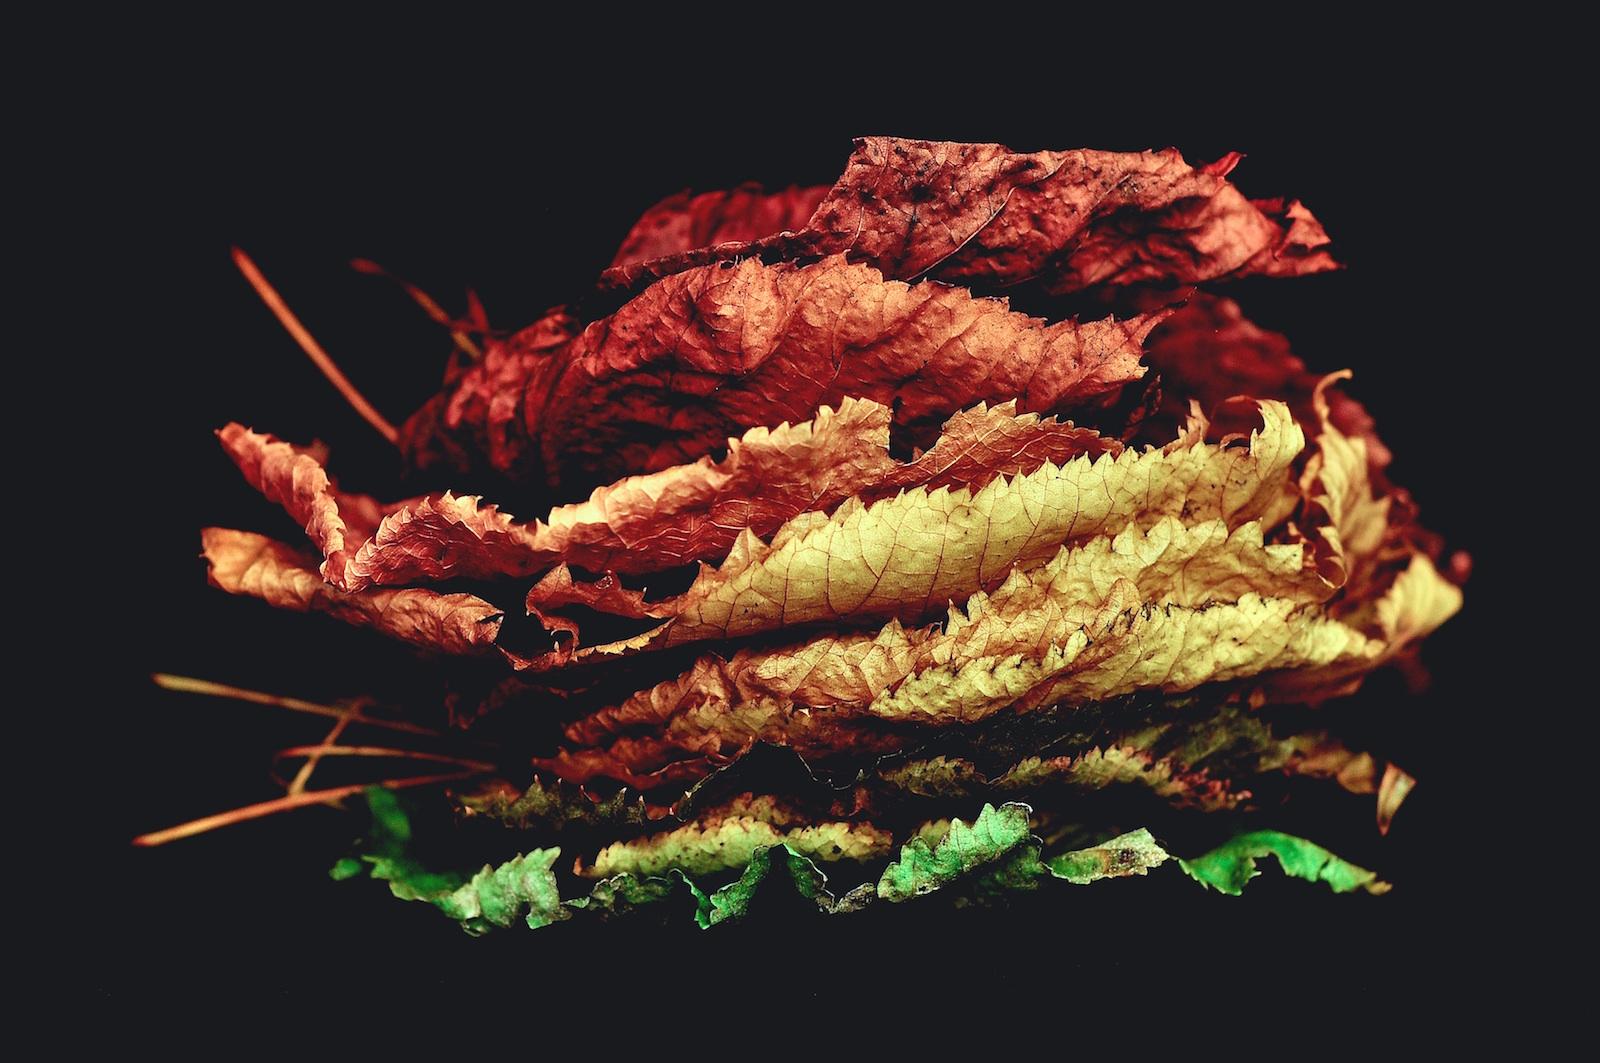 Mehrfarbige Blätter